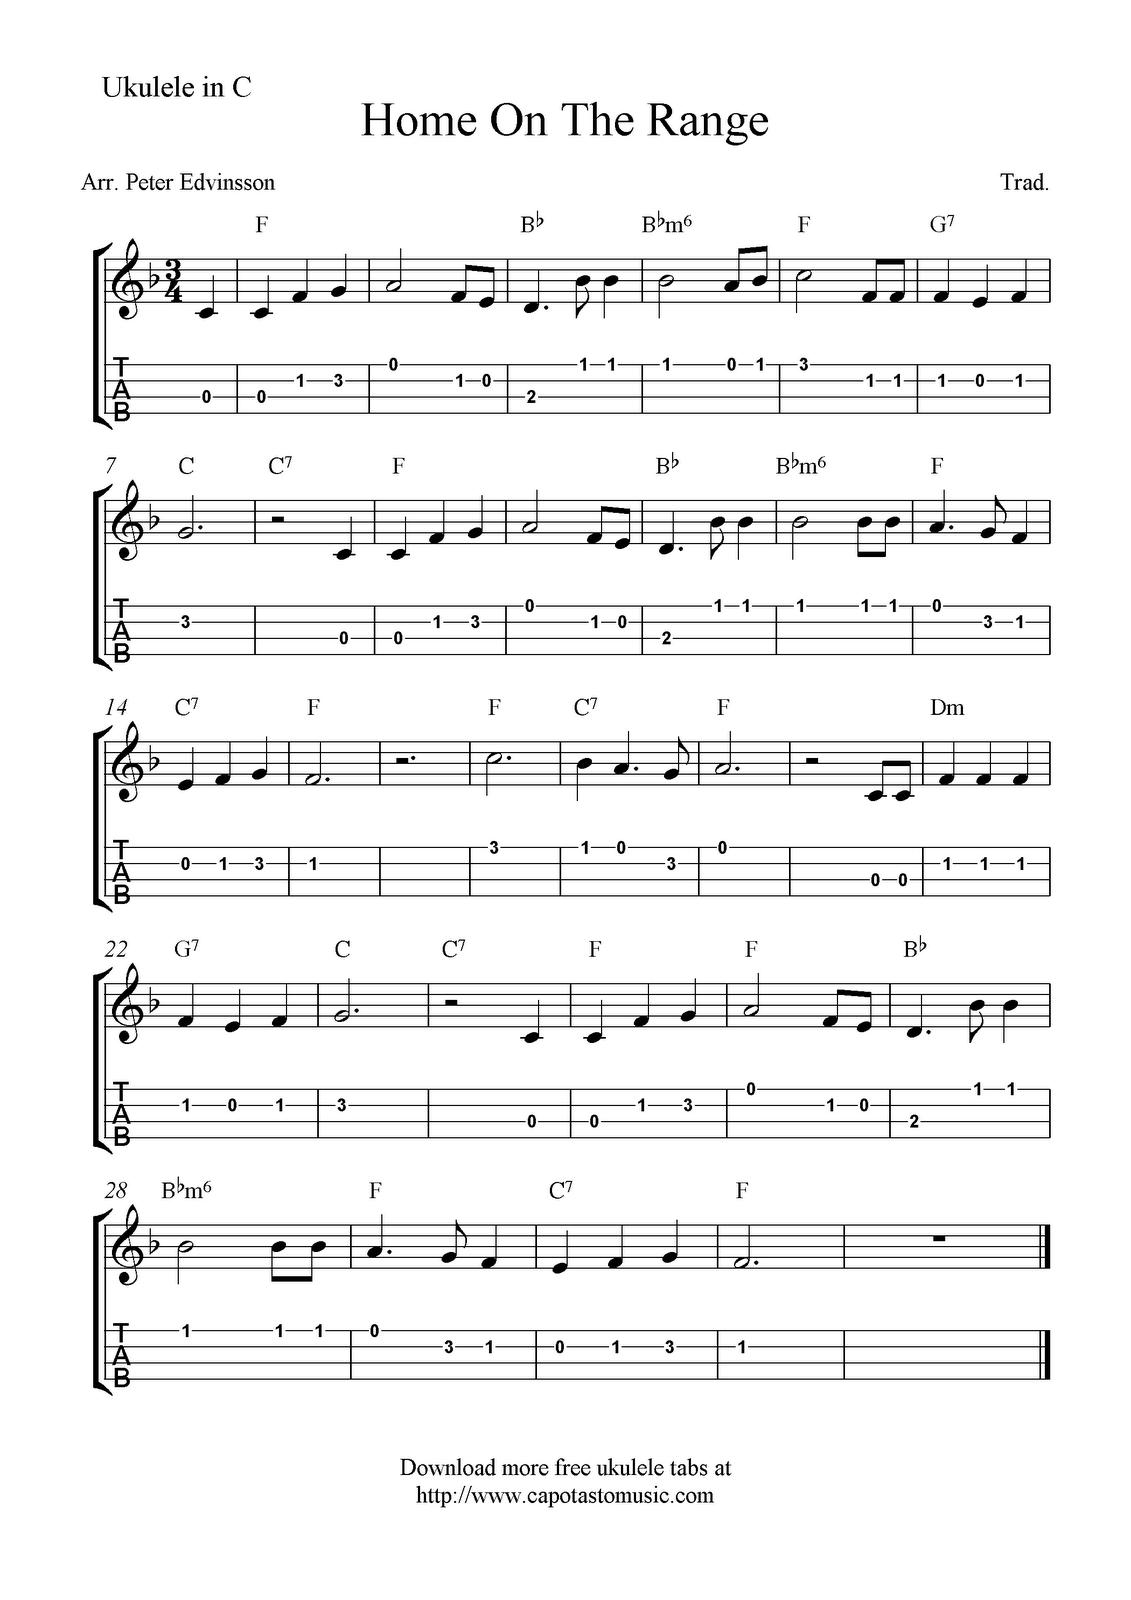 Home on the range ukulele sheet music free printable home on the range ukulele sheet music free printable hexwebz Image collections